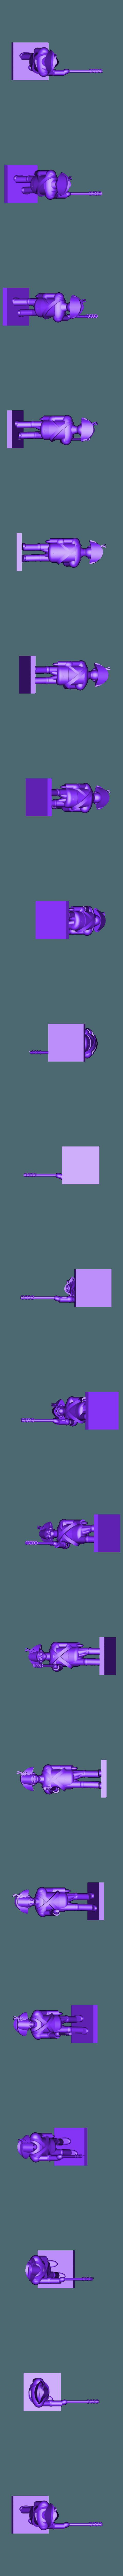 aus_sh_artman3.stl Download free STL file Napoleonics - Part 14 - Austrian Gun Crew • 3D printing design, Earsling